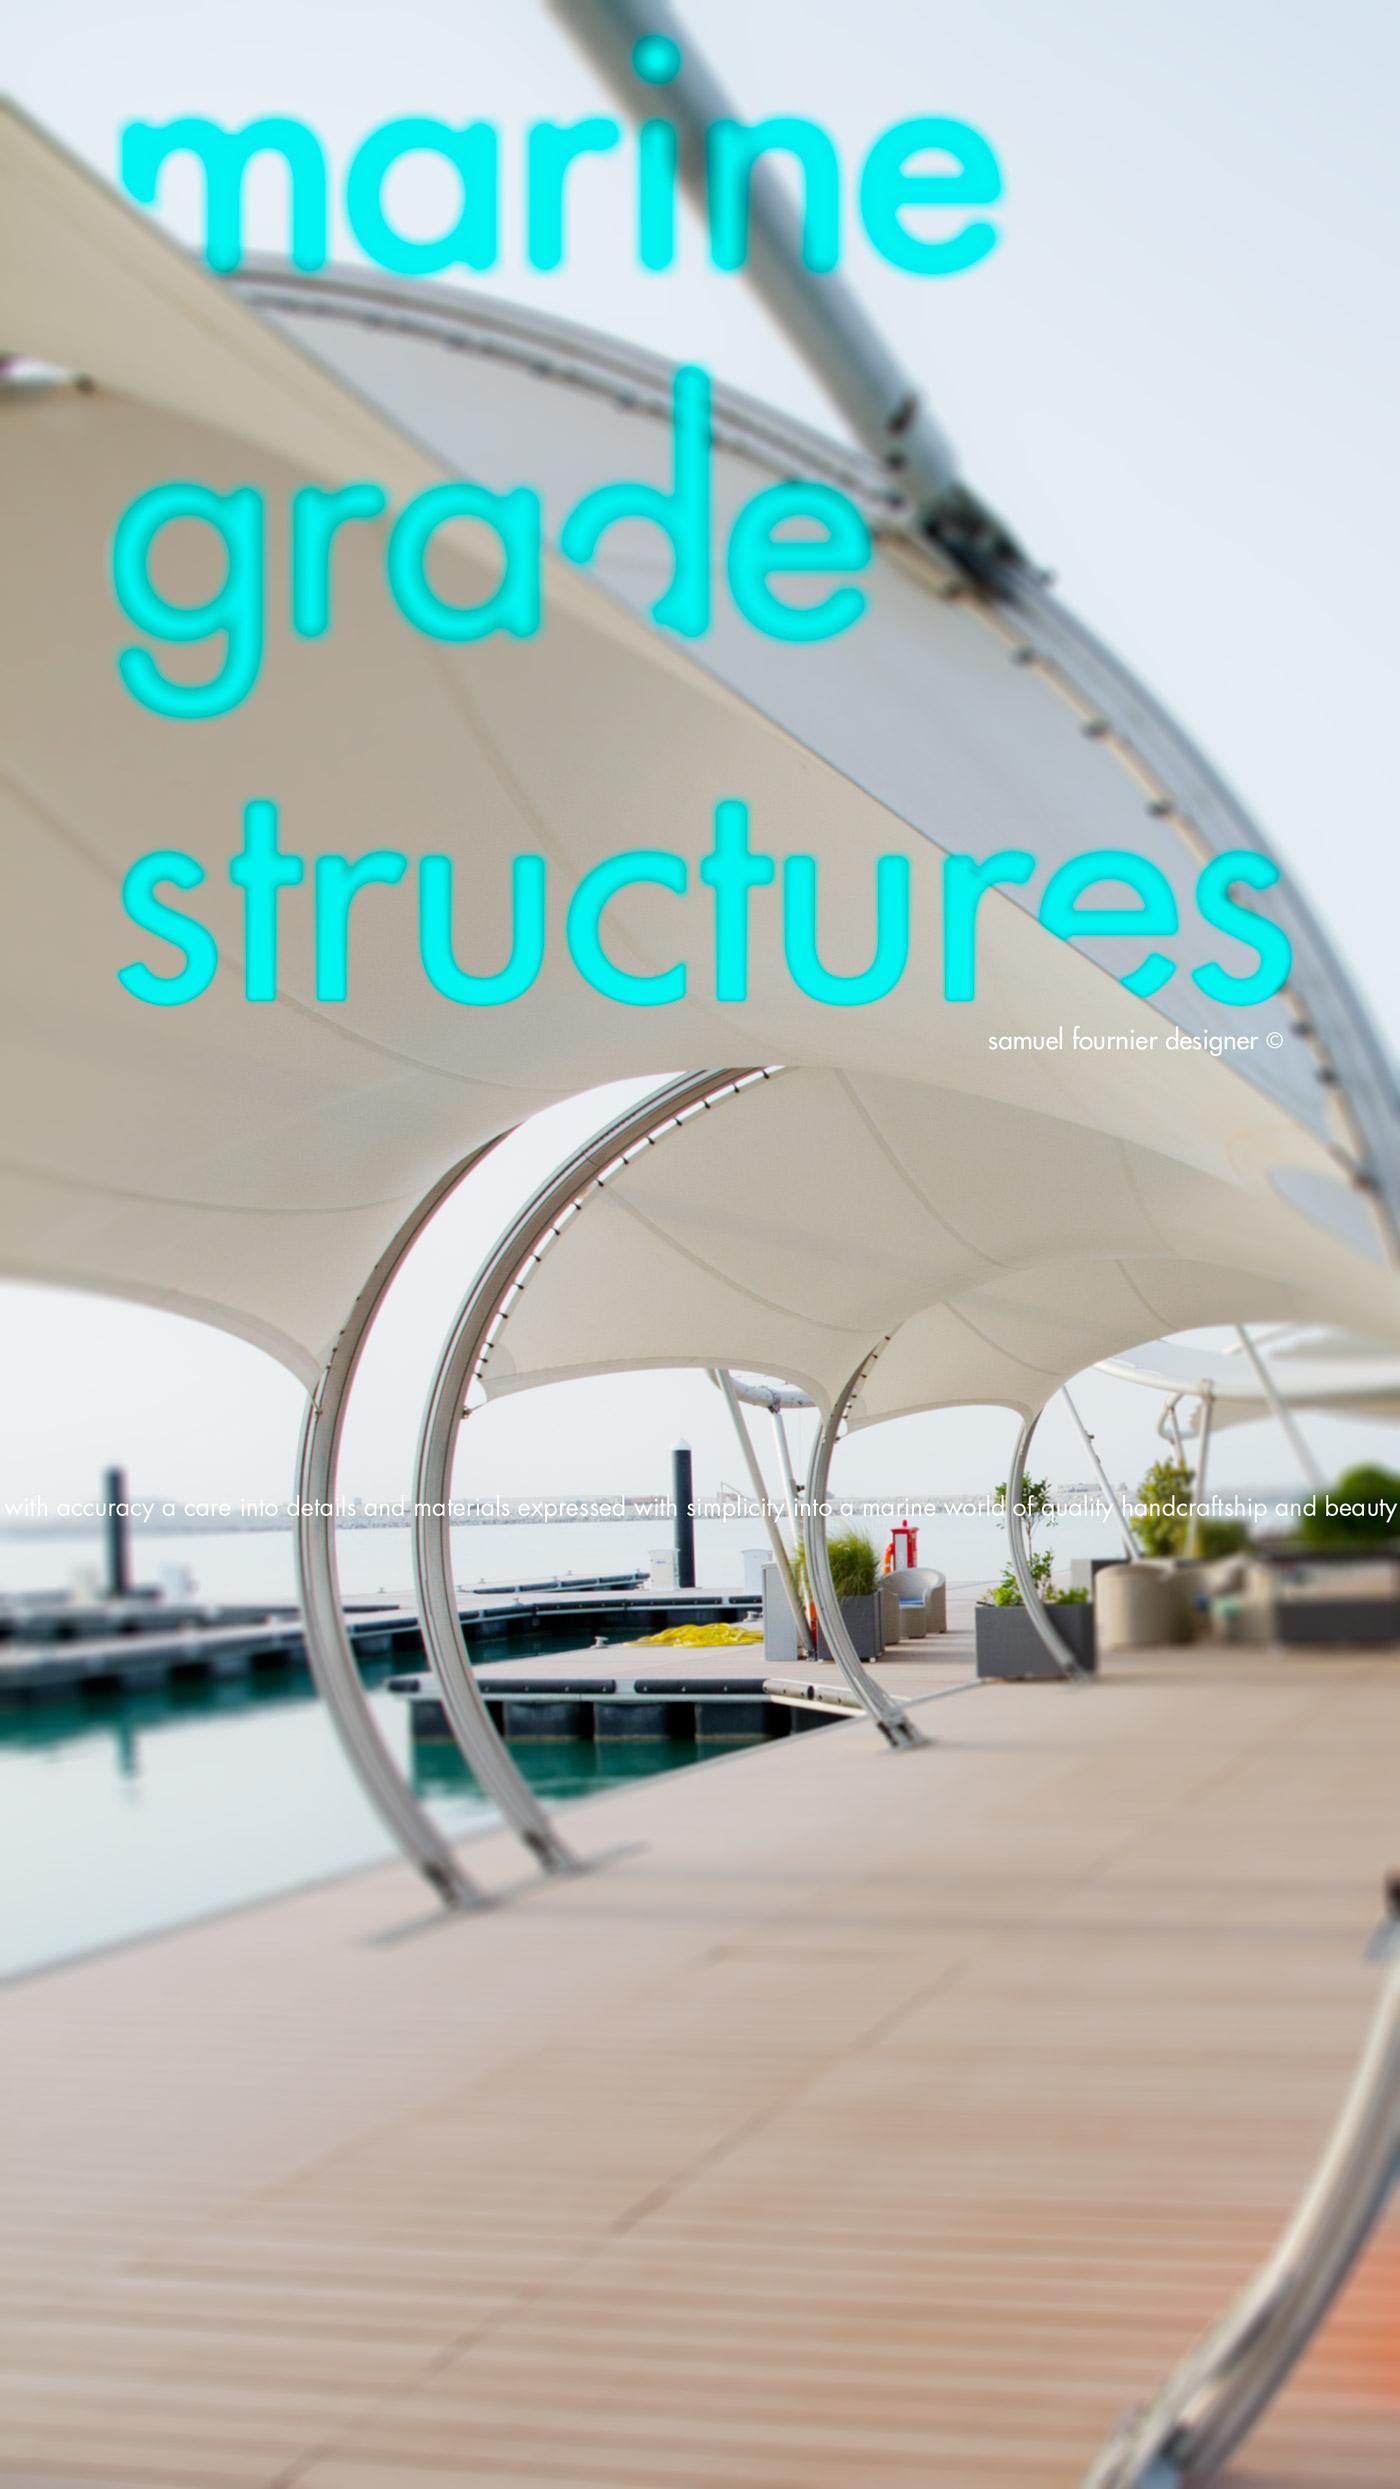 marinegradestructures_1400px_txt.jpg